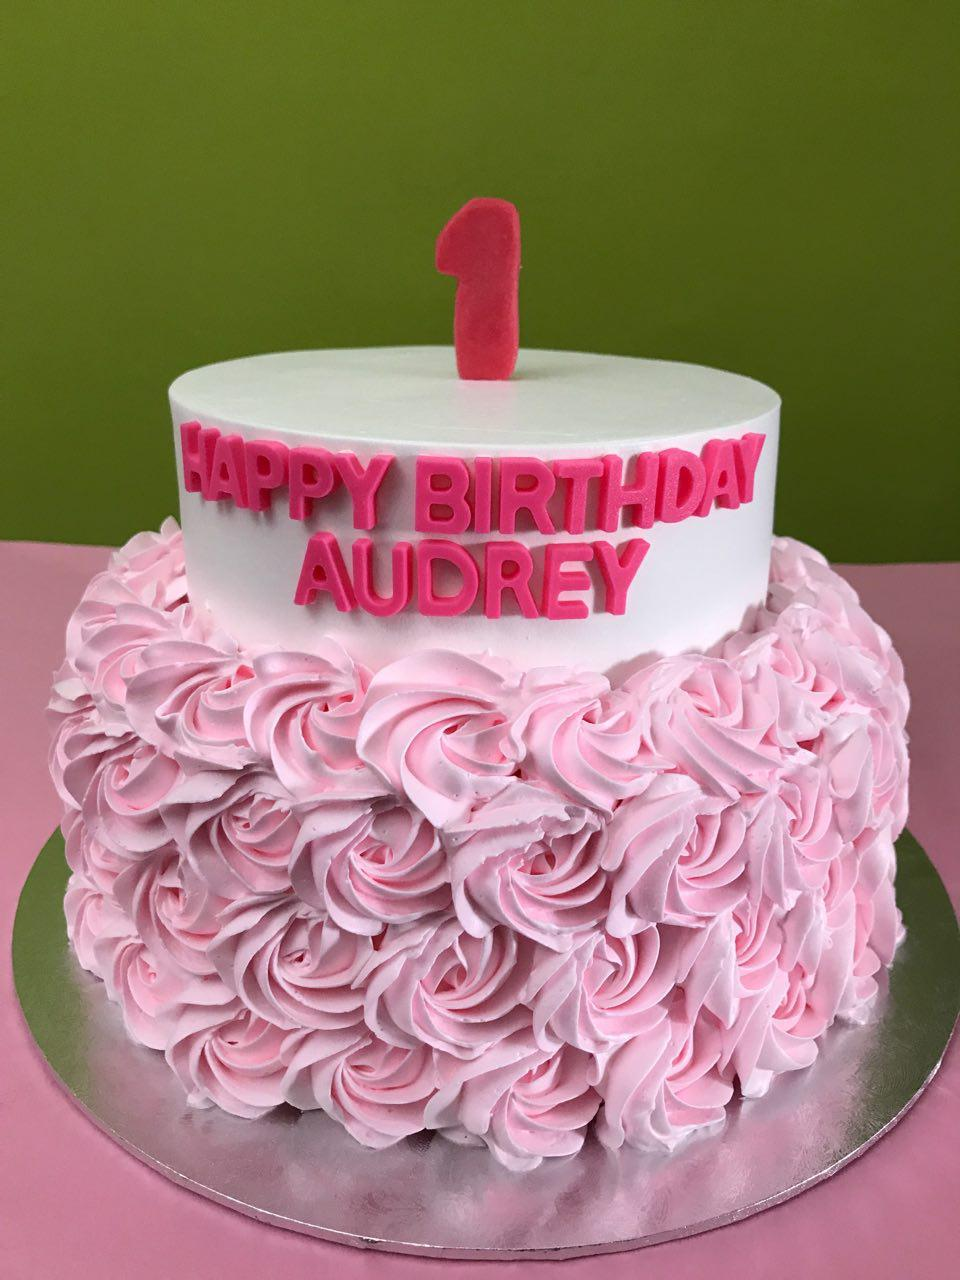 2-tier Light Pink Rosette